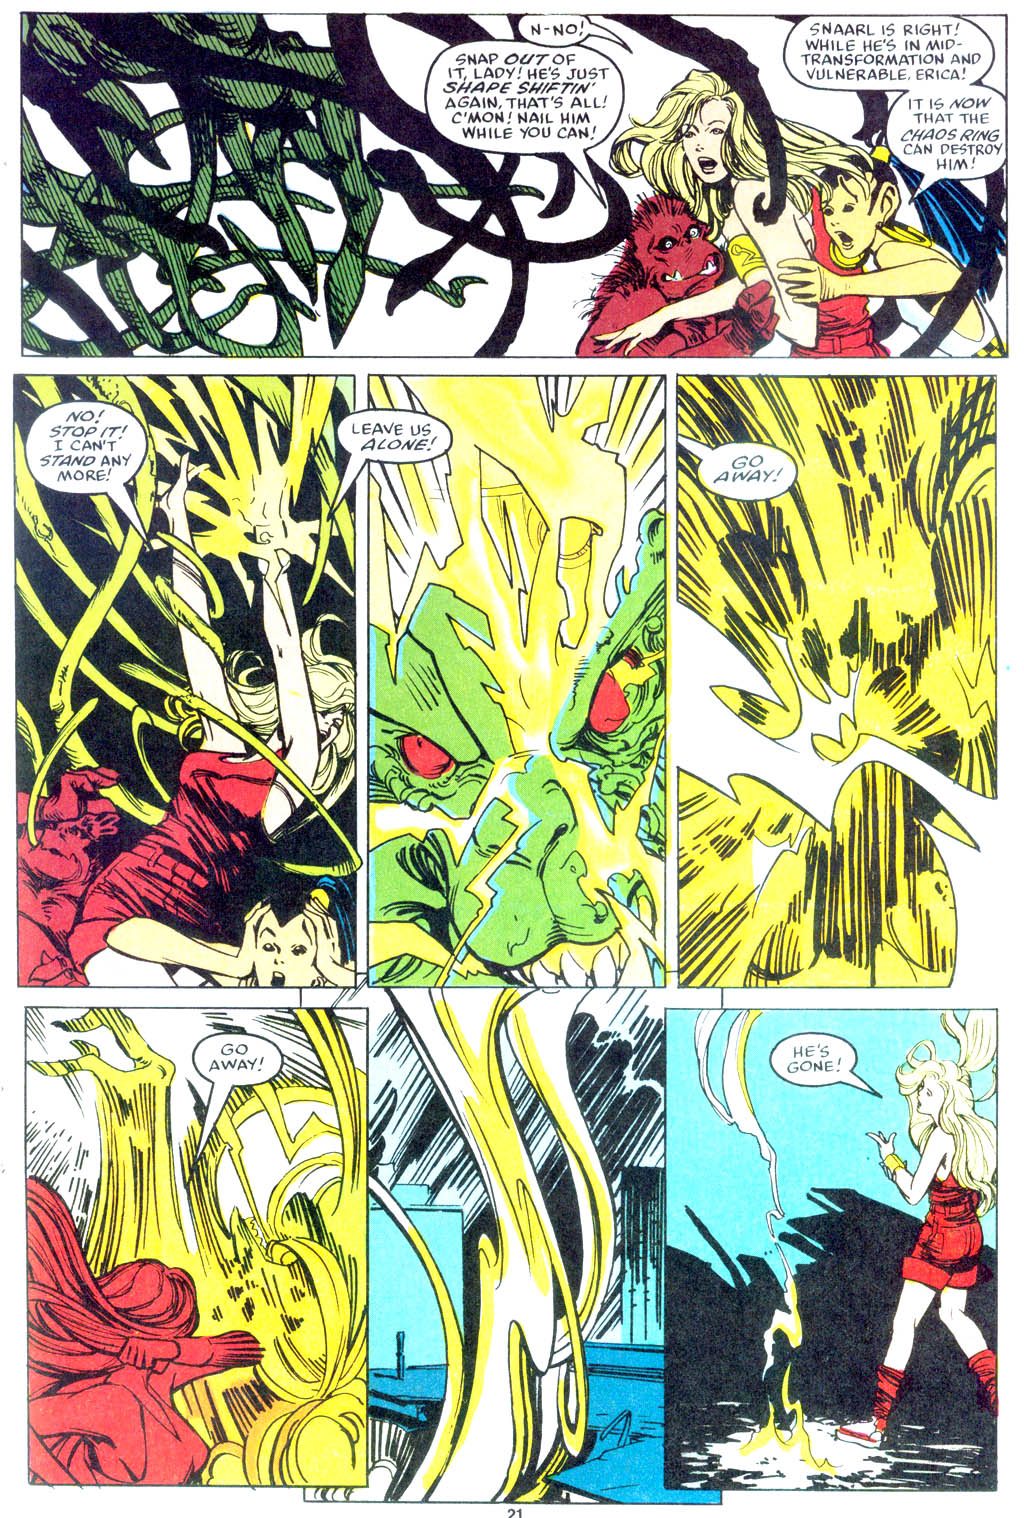 Read online Spellbound comic -  Issue #1 - 22